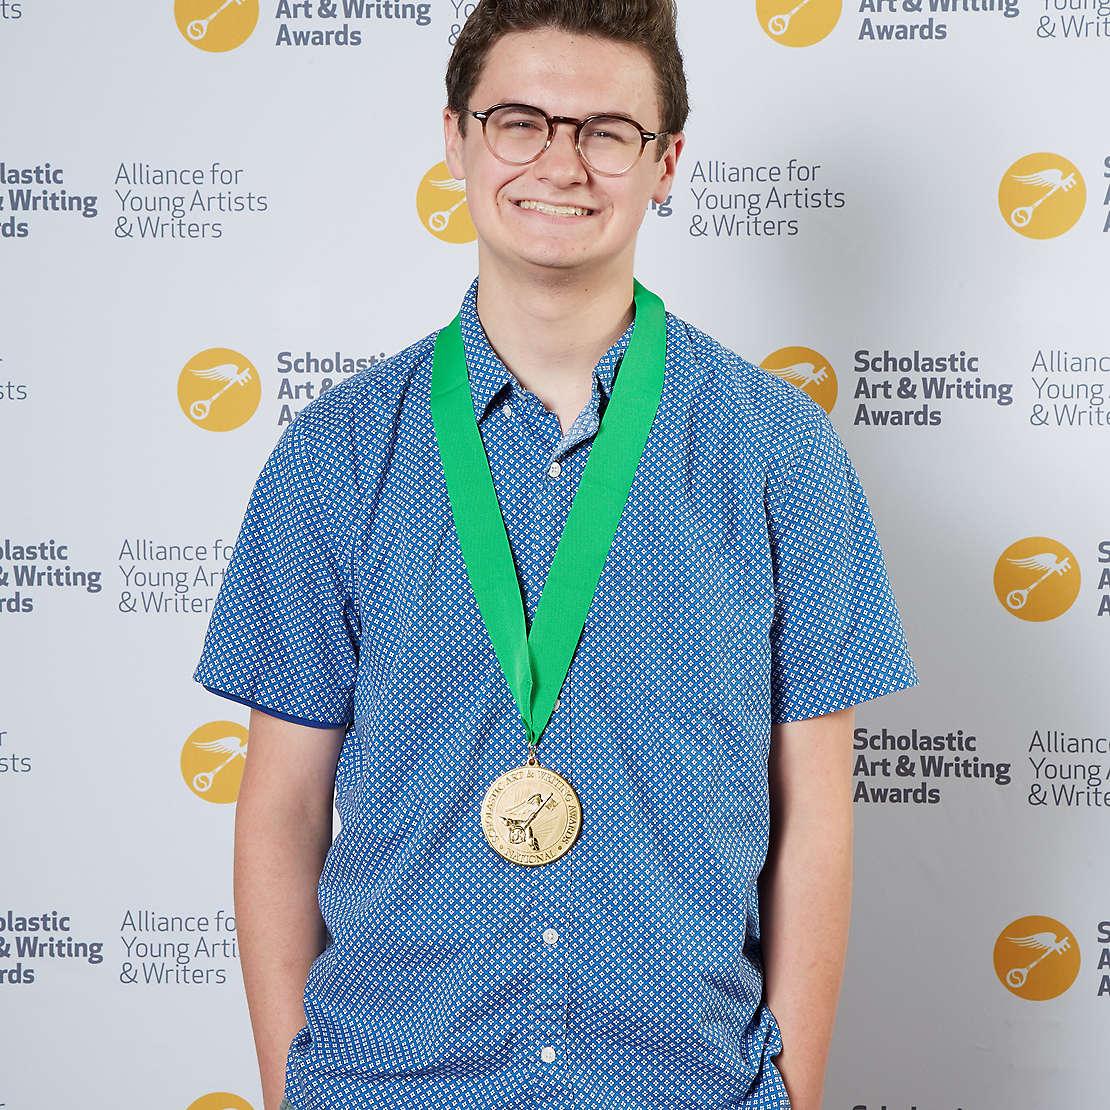 scholastic award winner